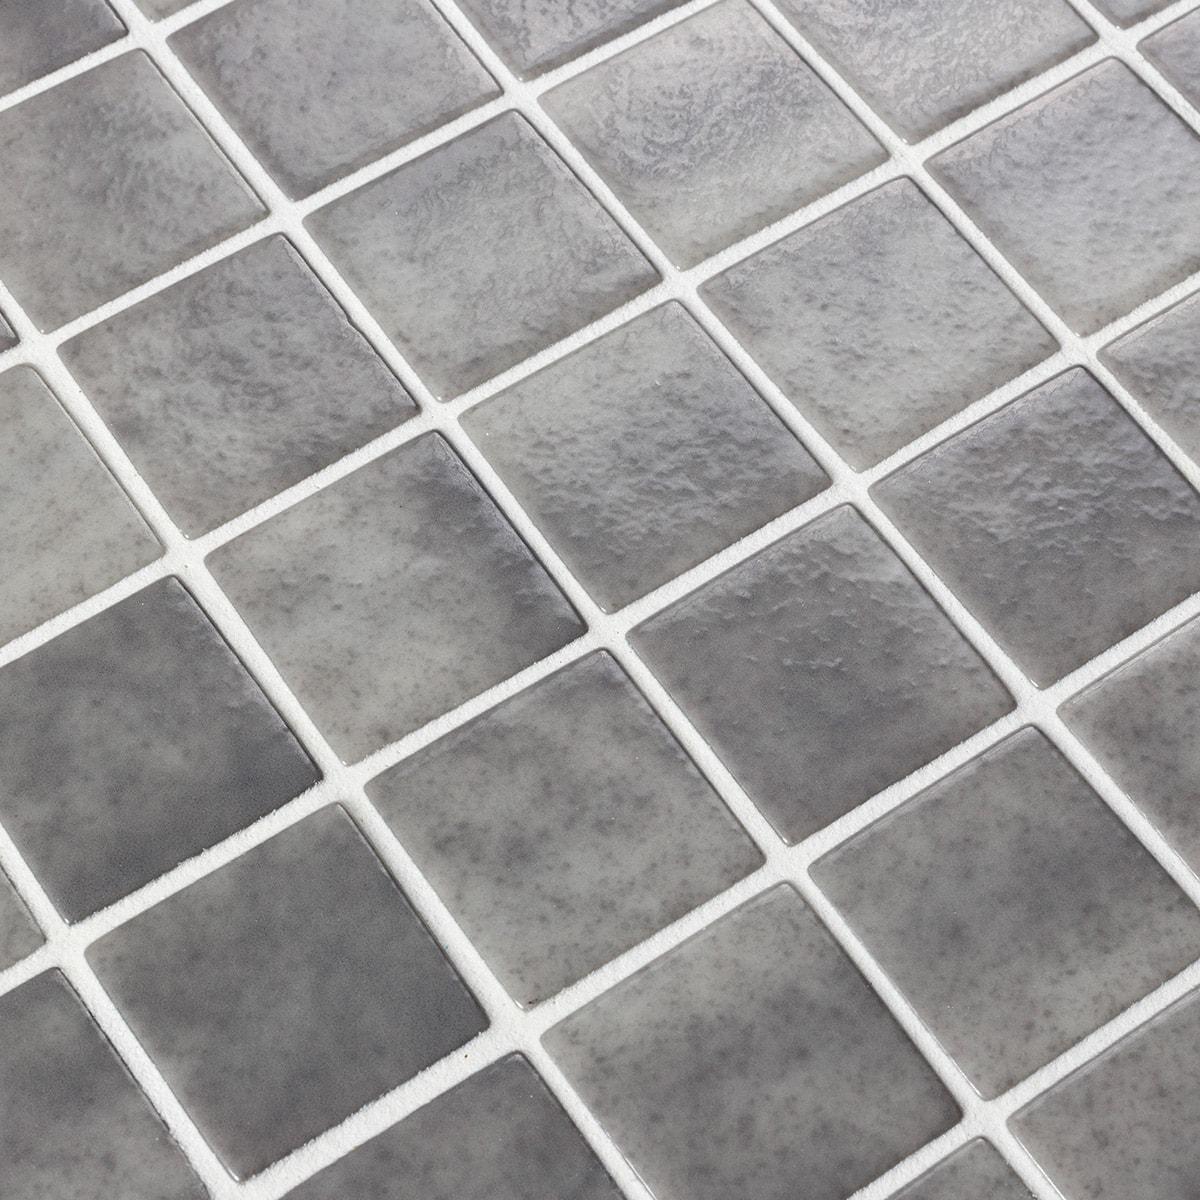 5060-A-Safe-Safe-steps-Mosaic-Ezarri.jpg